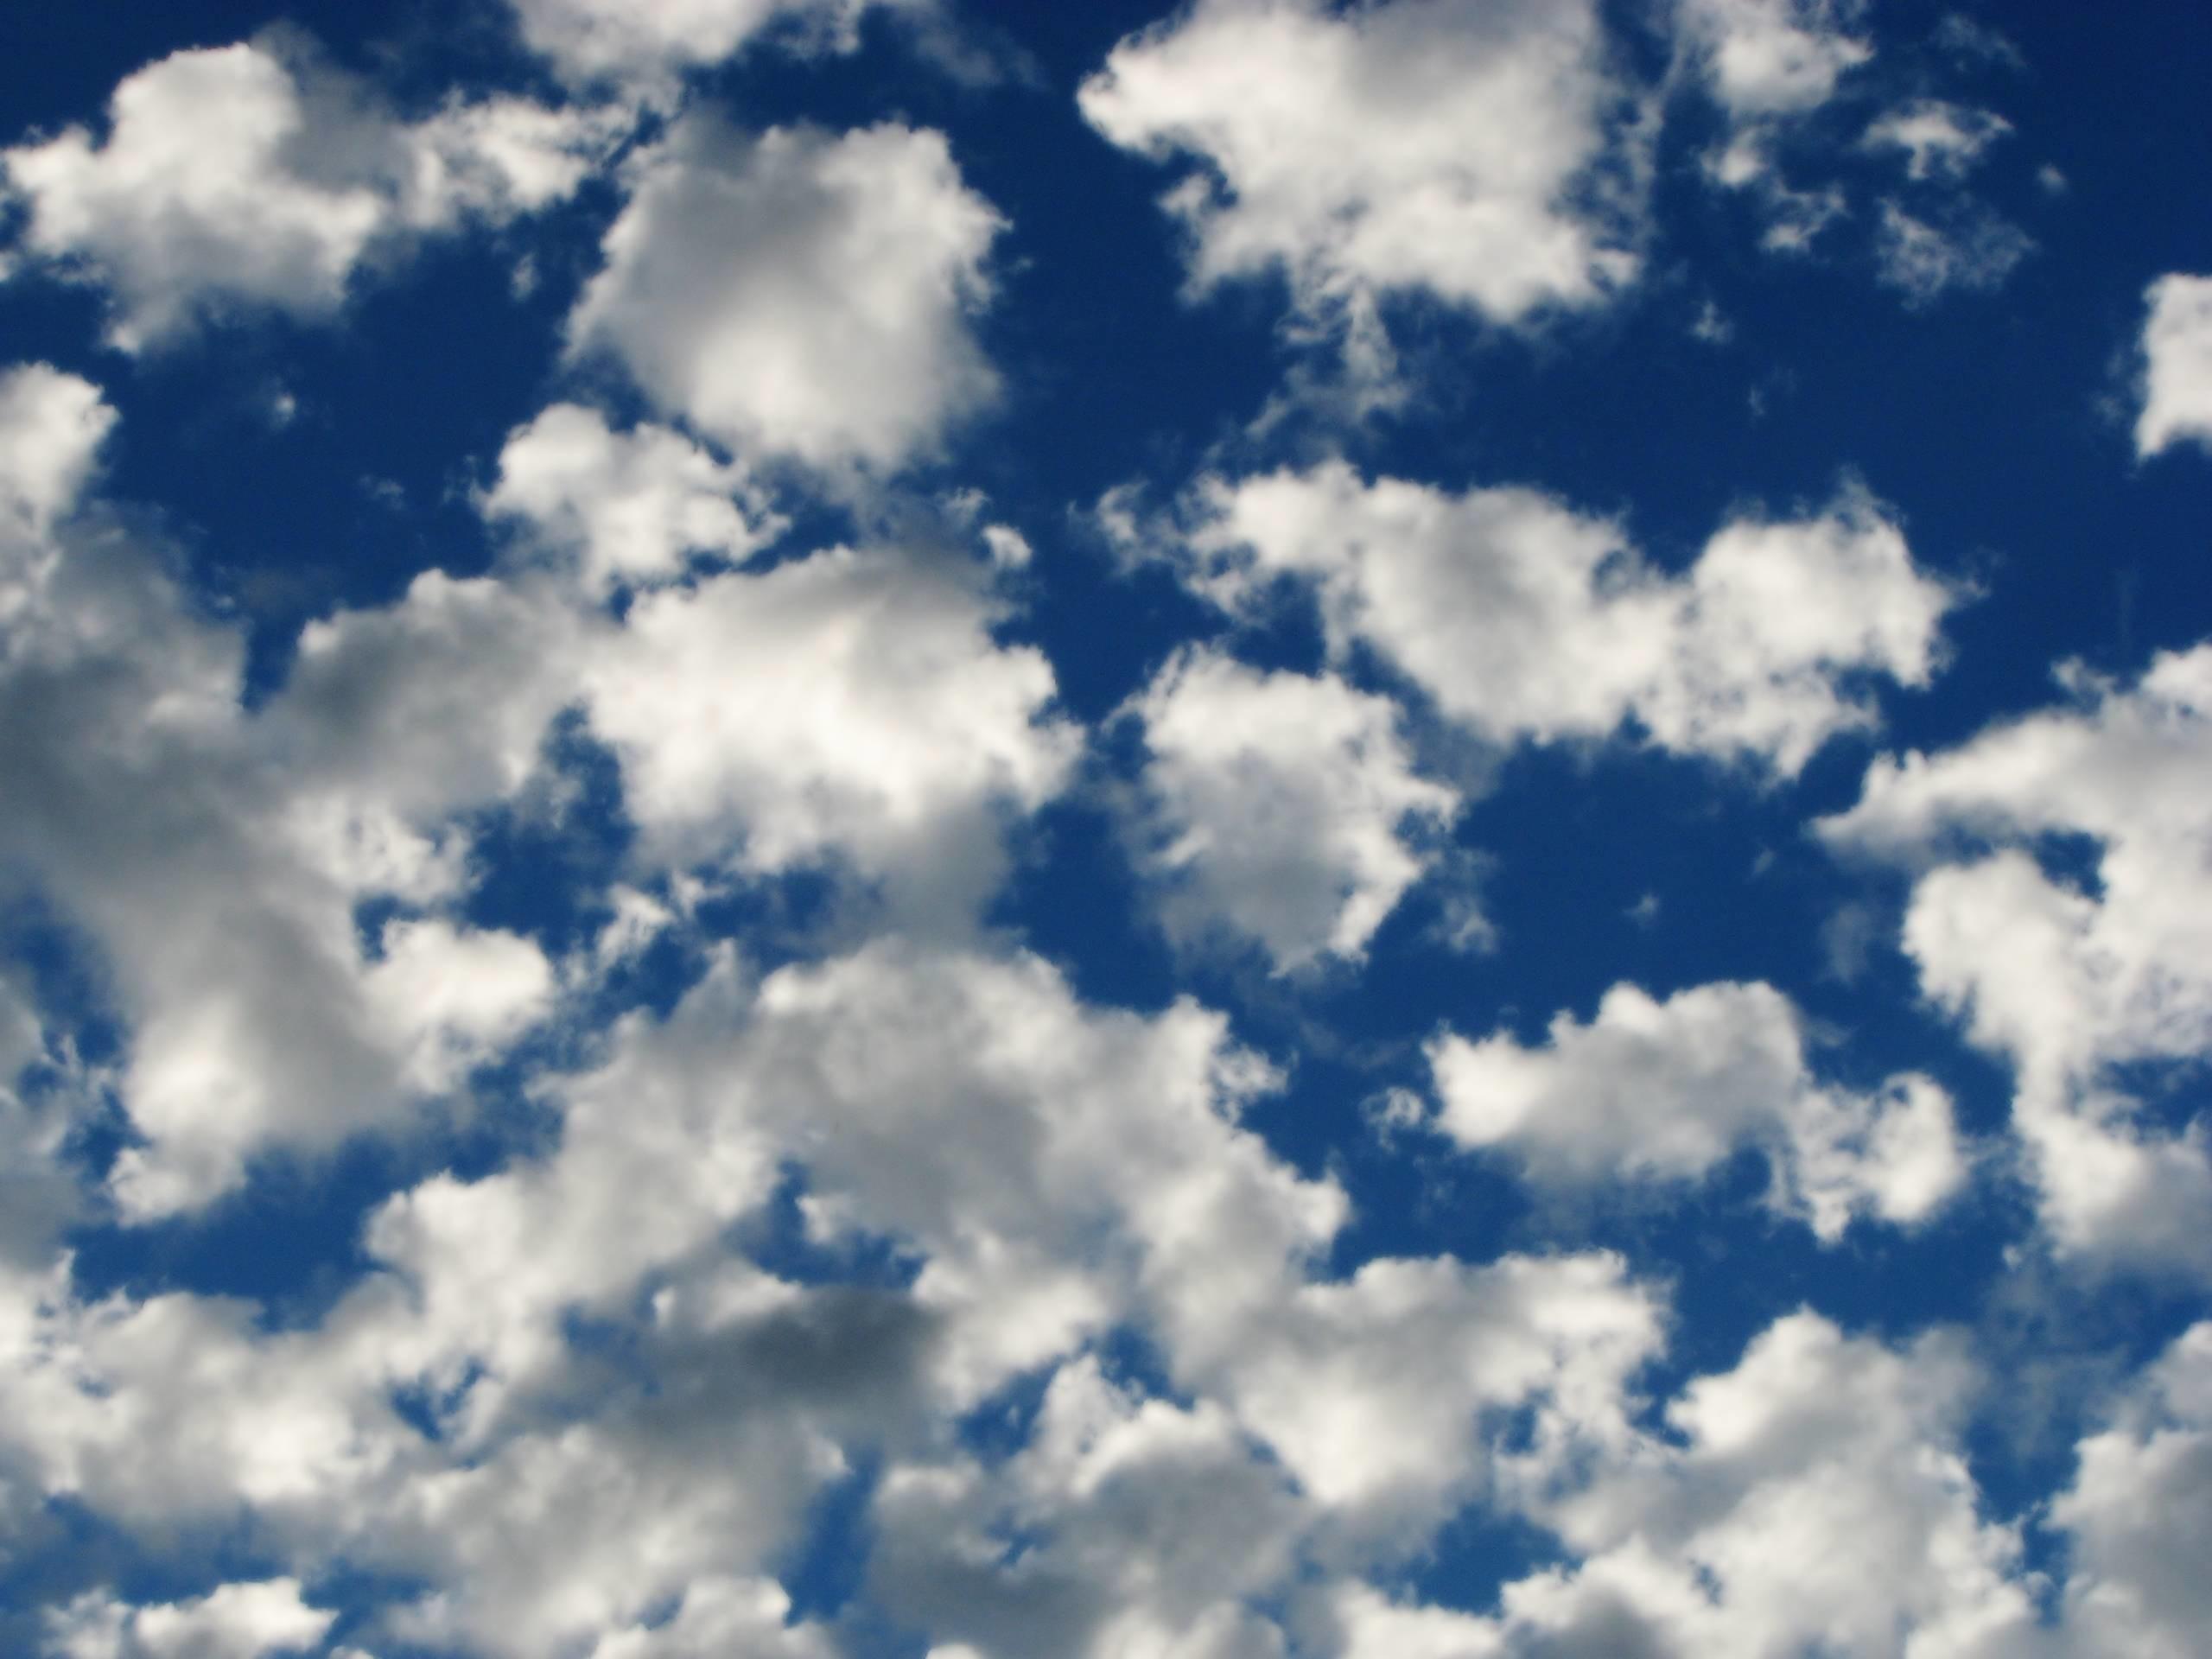 skull clouds Wallpaper Background | 20560 | Desktop Wallpaper | Pinterest | Cloud  wallpaper, Wallpaper backgrounds and Cloud